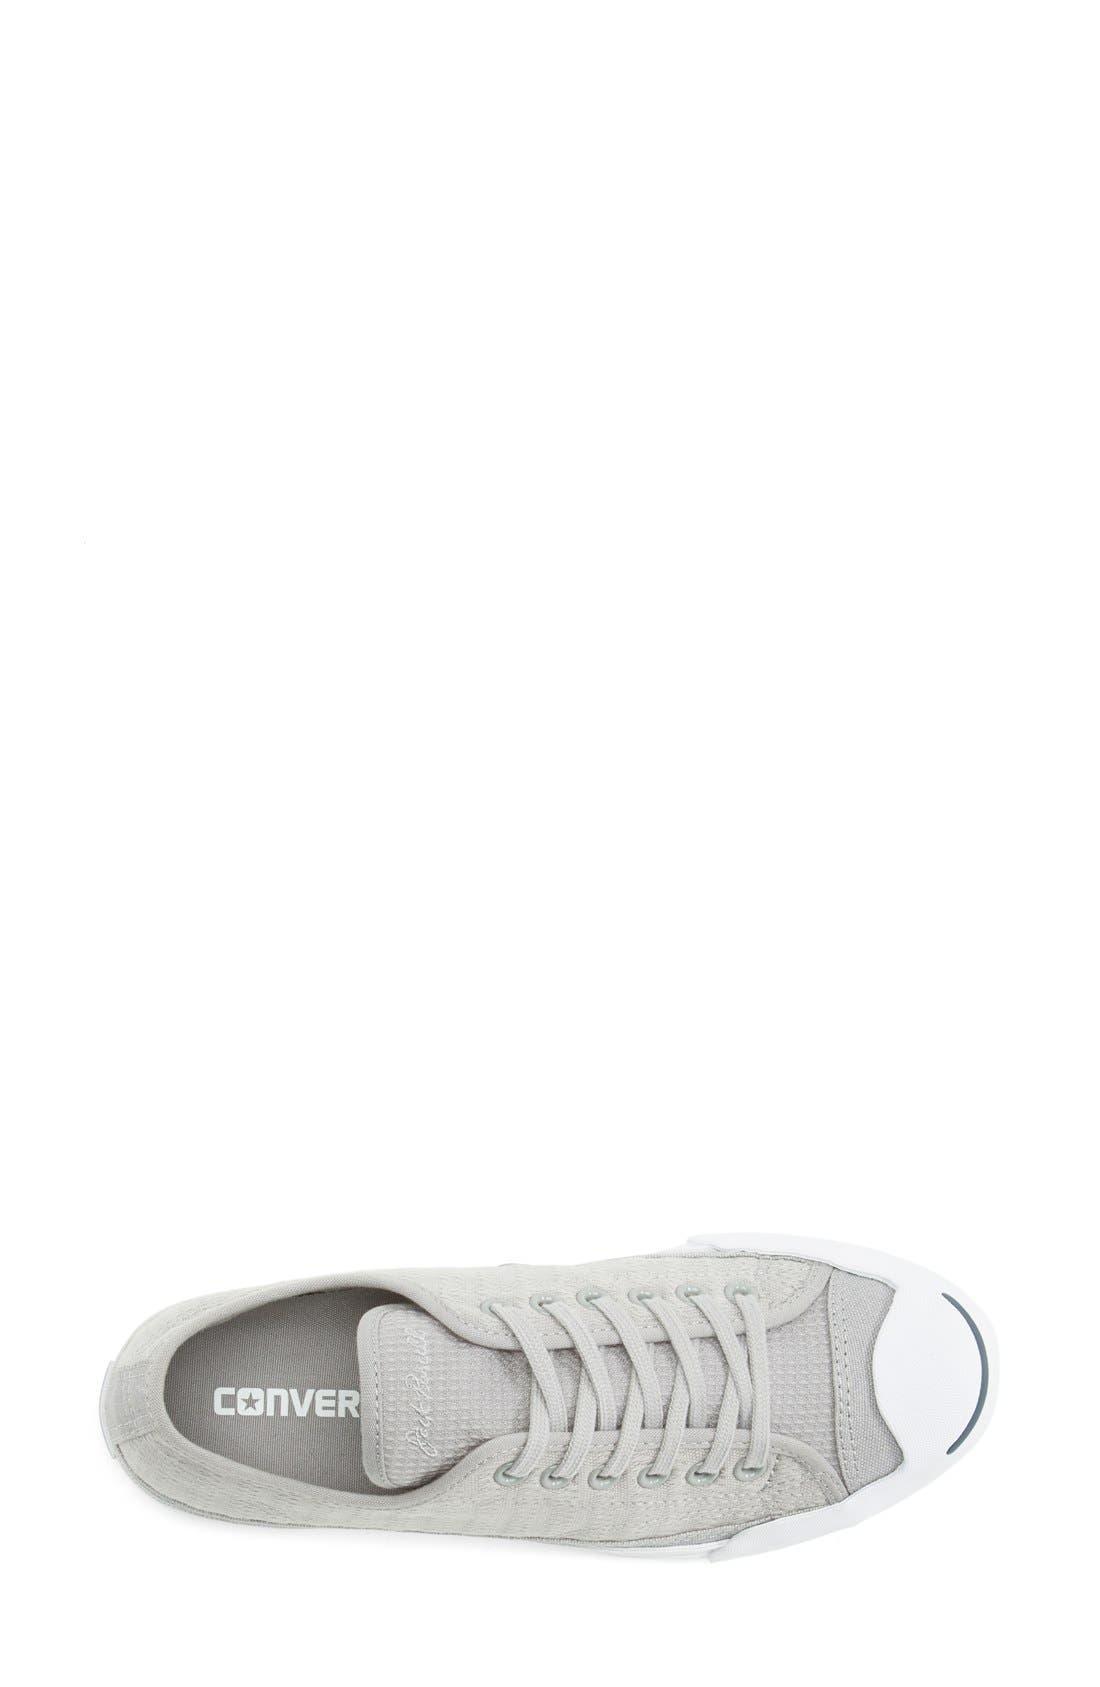 'Jack Purcell' Garment Dye Low Top Sneaker,                             Alternate thumbnail 4, color,